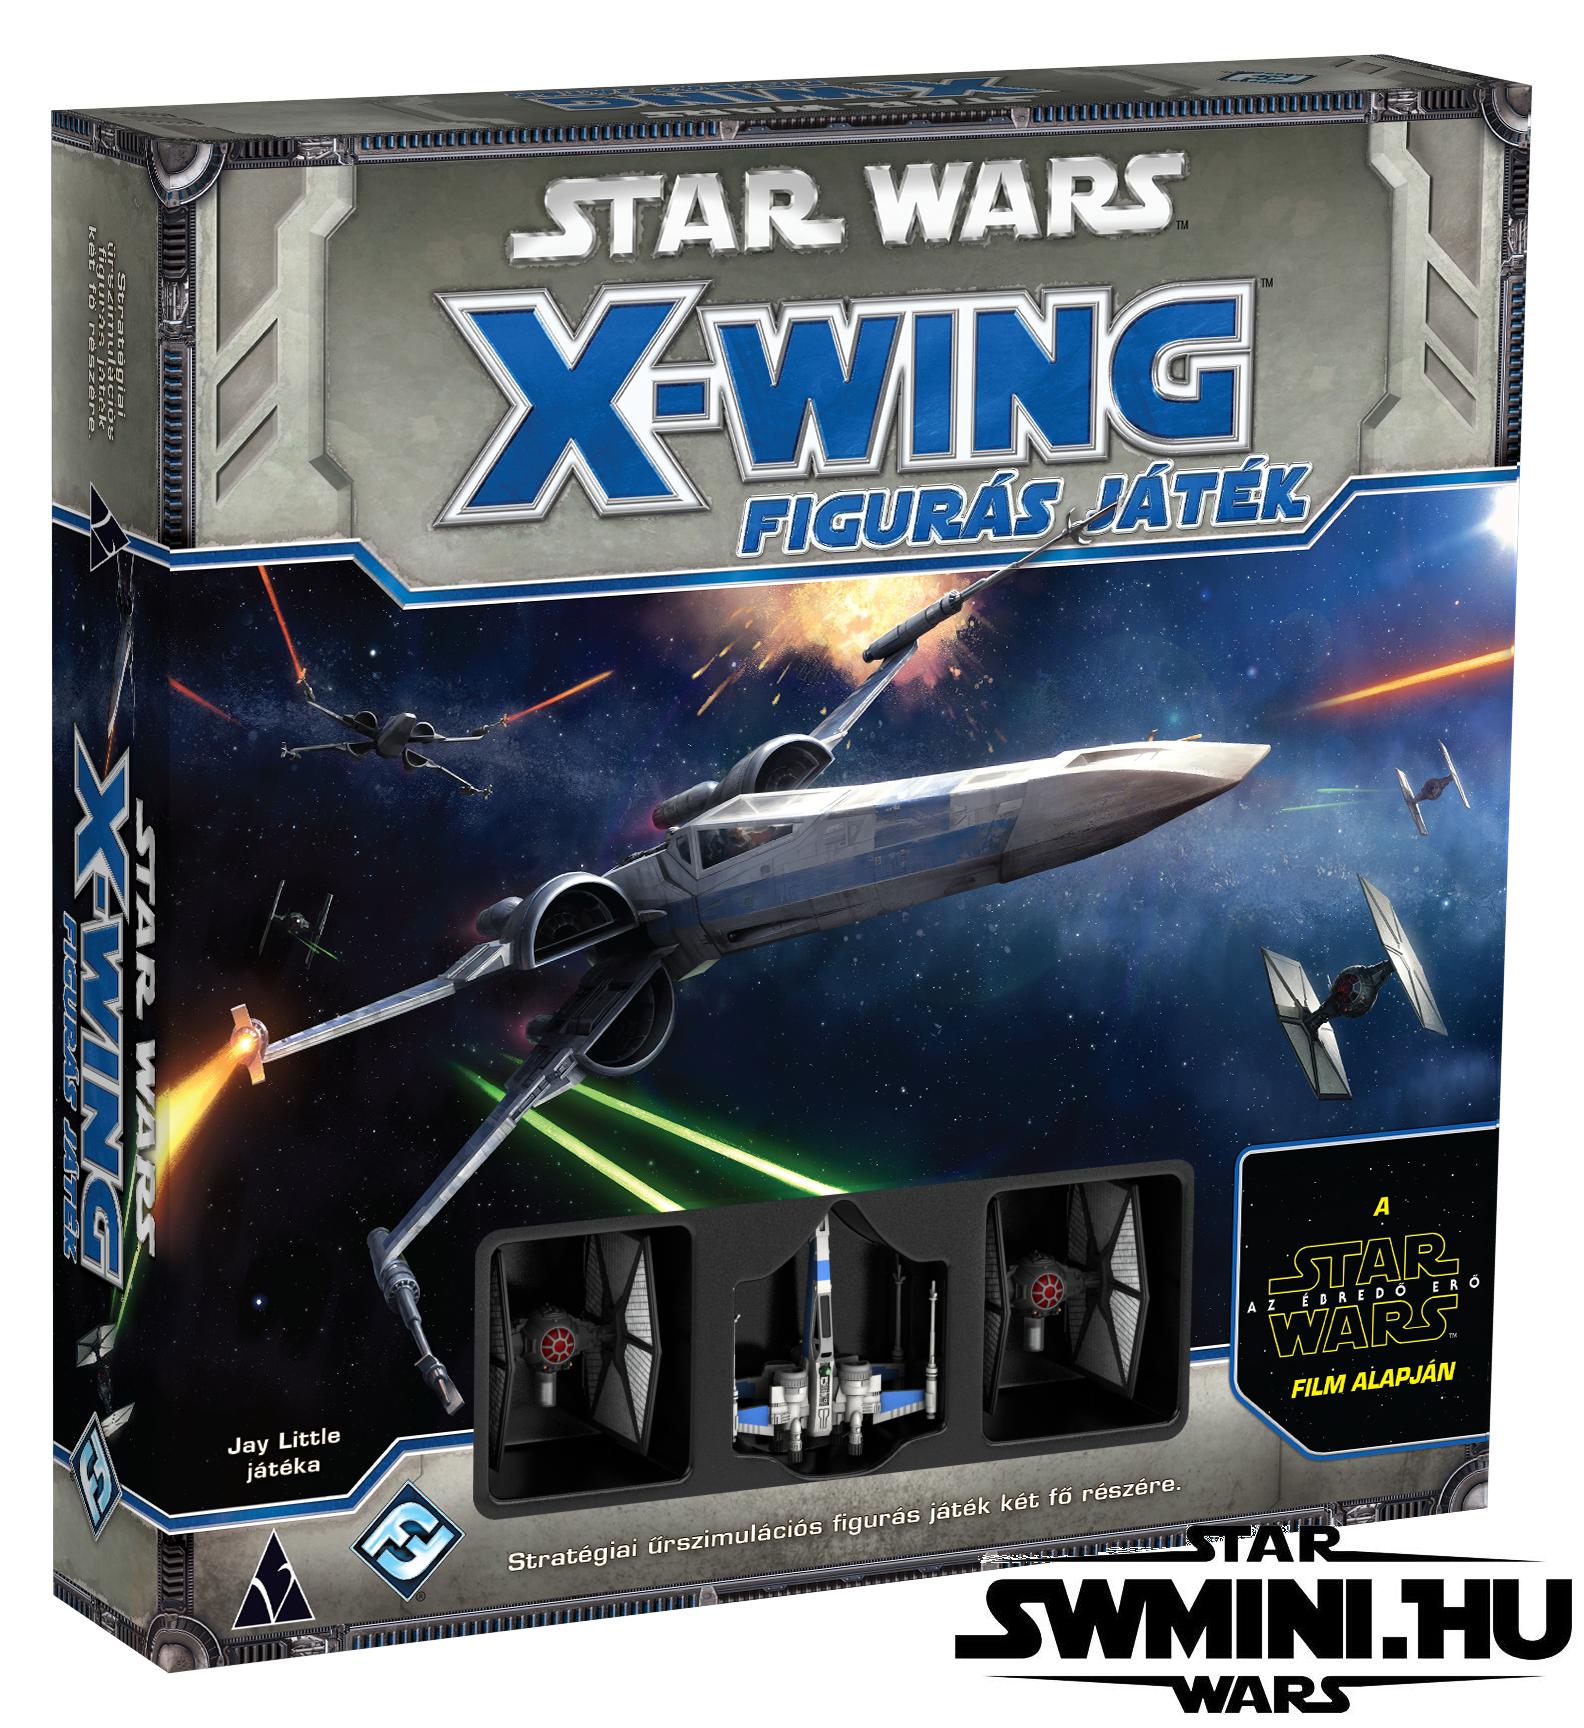 star-wars-x-wing-az-ebredo-ero-figuras-jatek-ff9.png